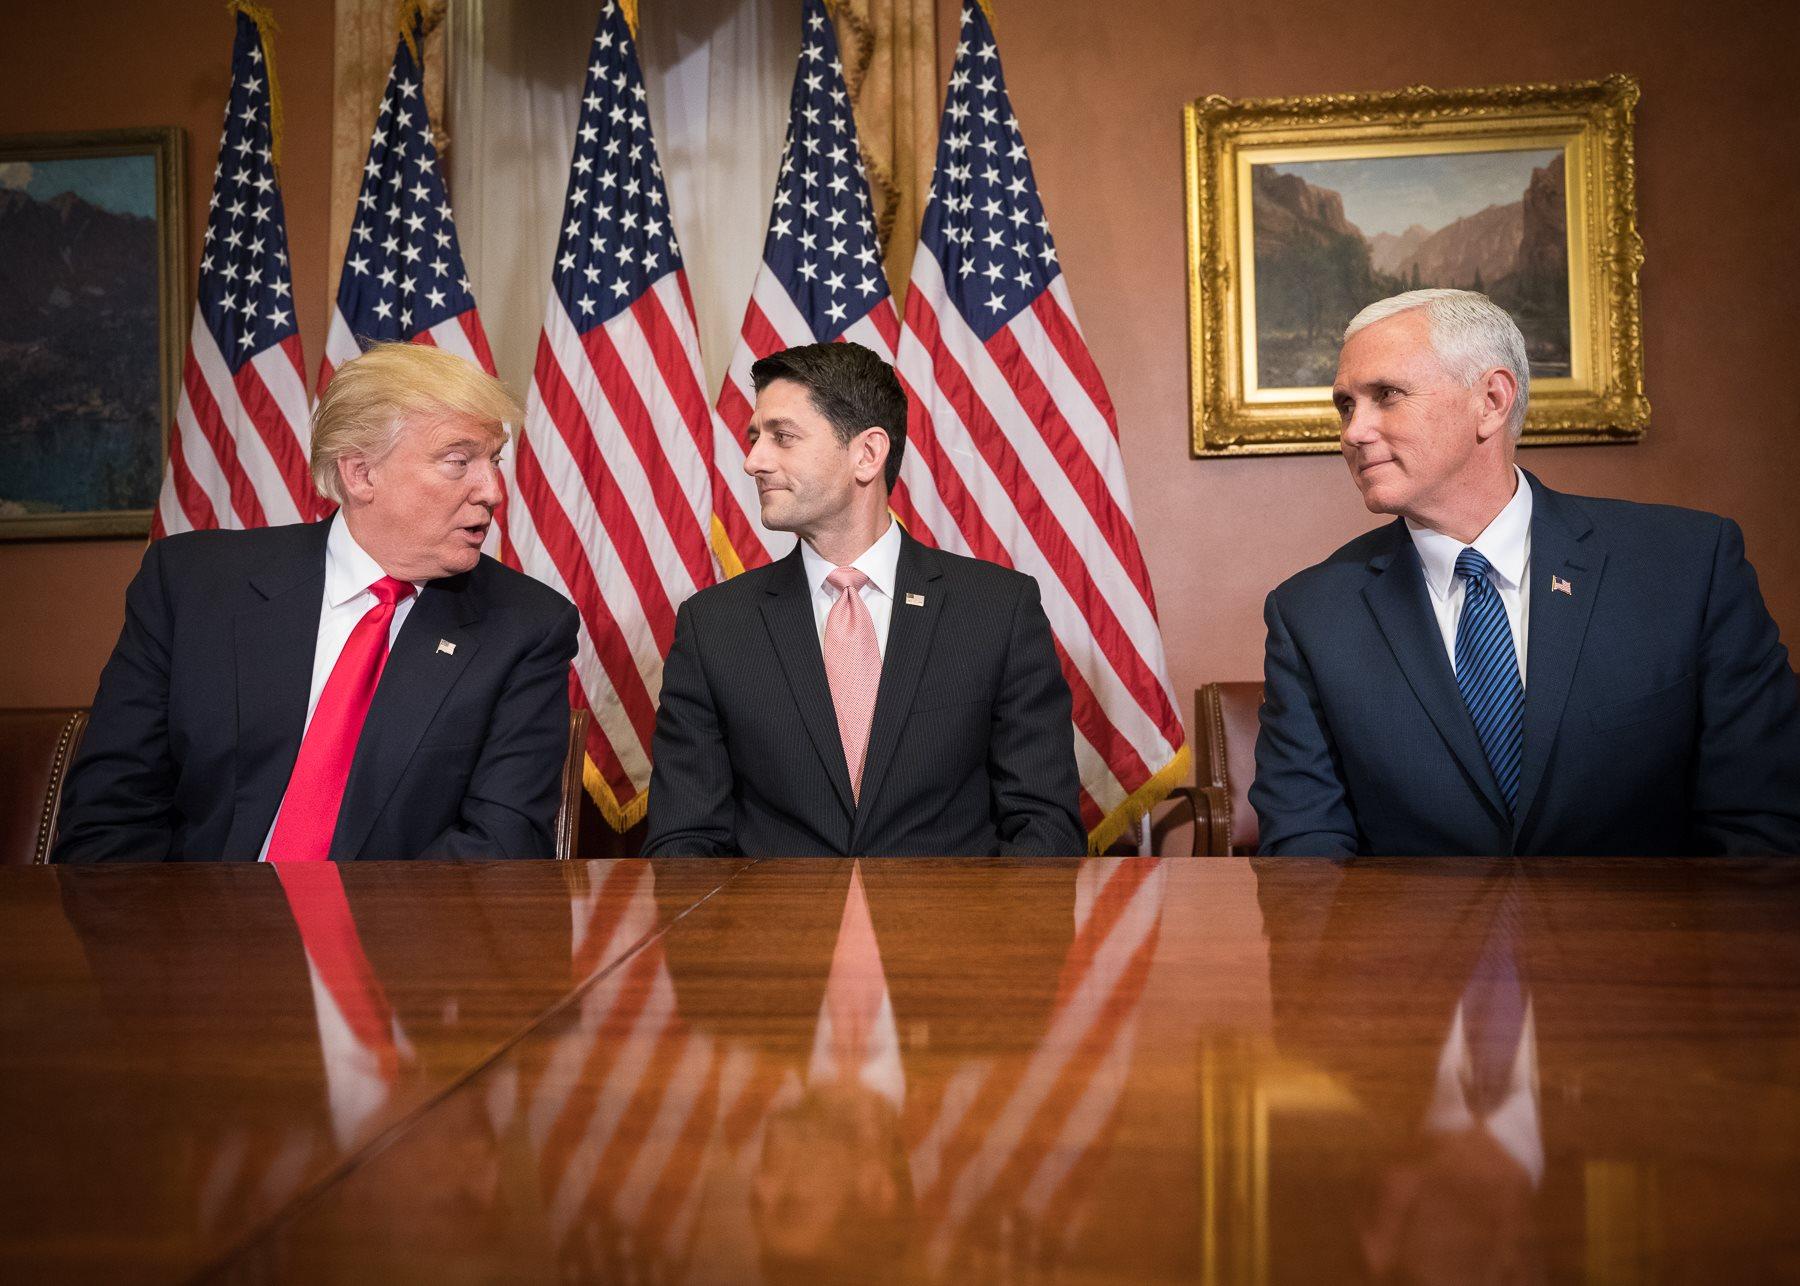 Donald Trump, Paul Ryan, and Mike Pence